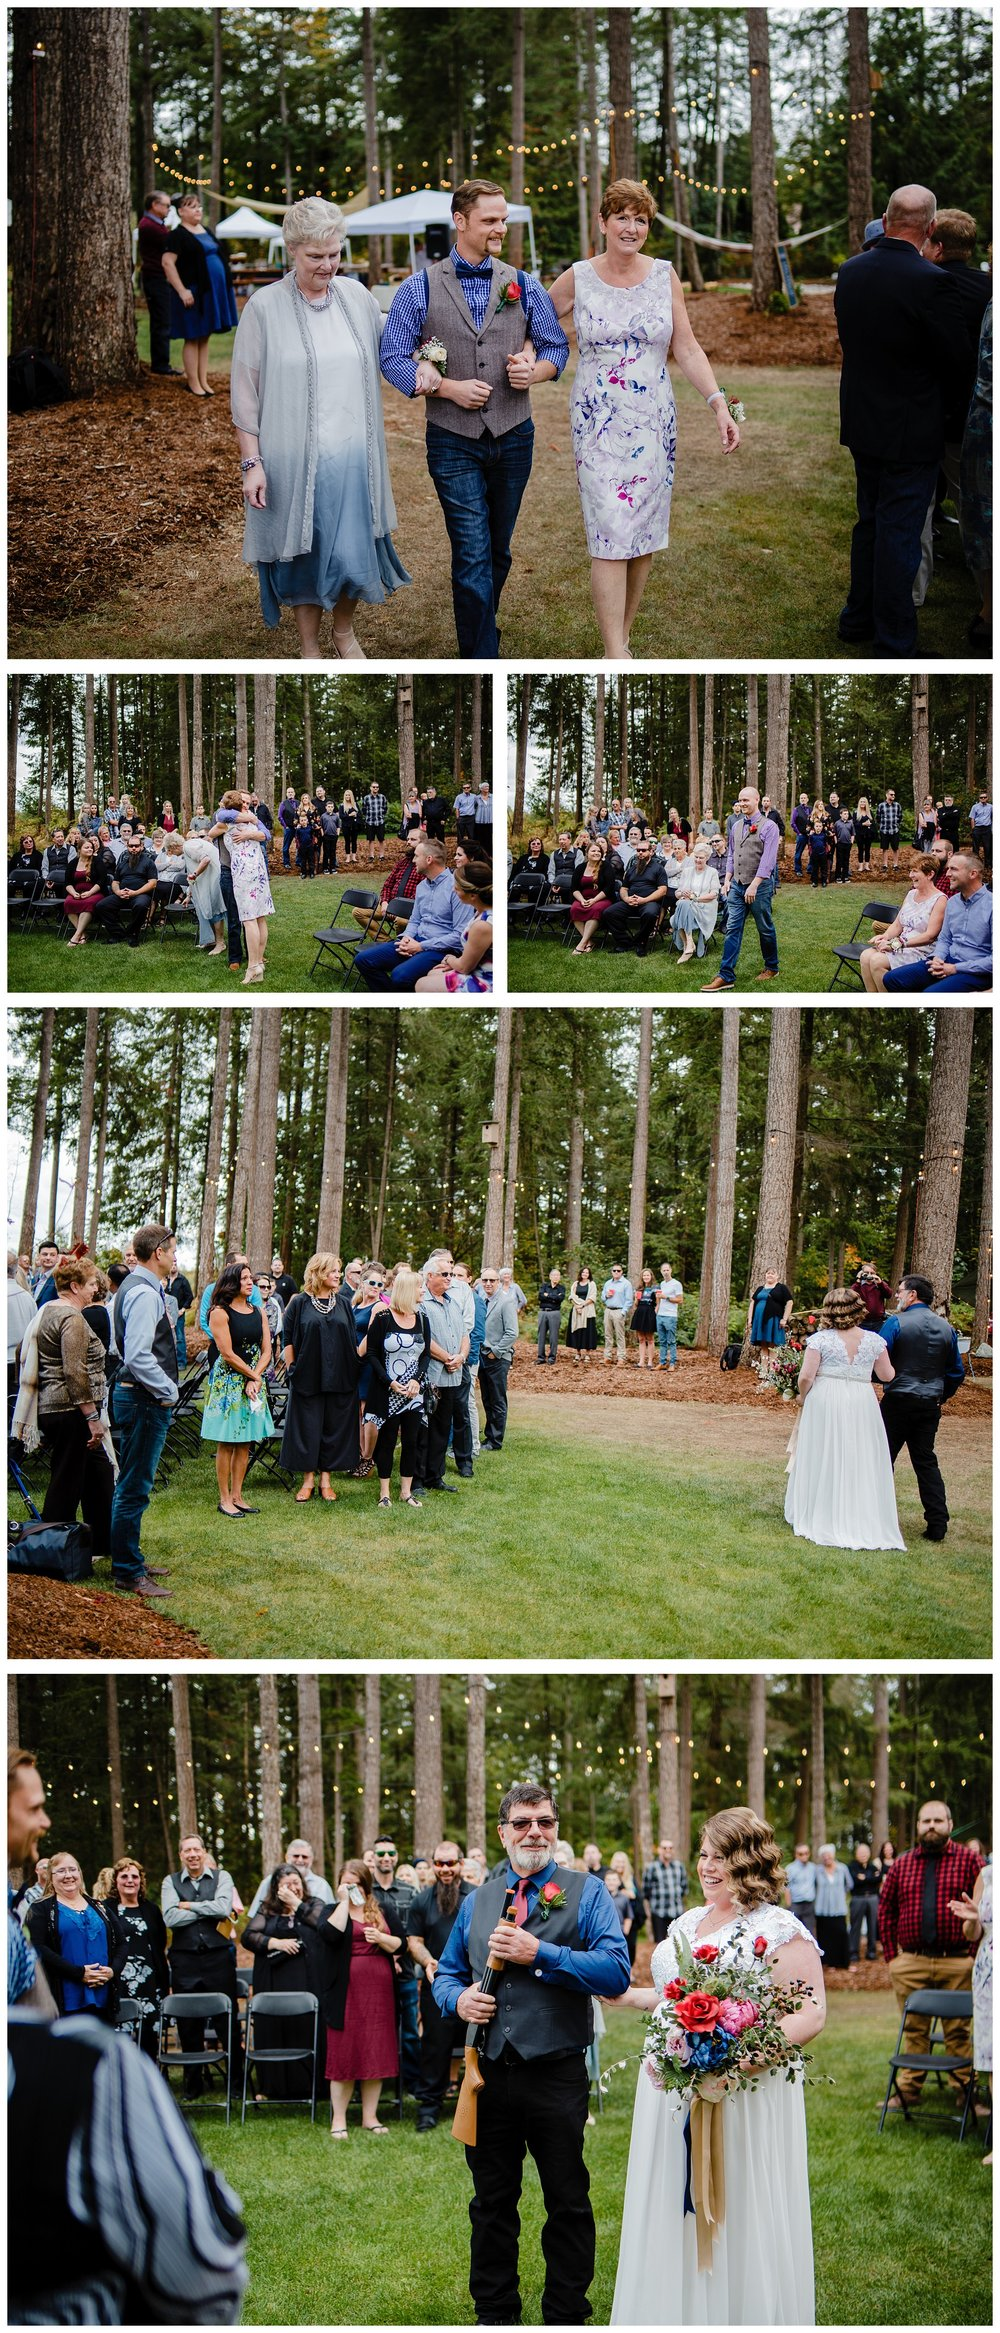 Aldergrove Park Fall Backyard Wedding Photographer Pregnant Bride Tent Outdoor BC Canada Best Wedding Photographer_0035.jpg